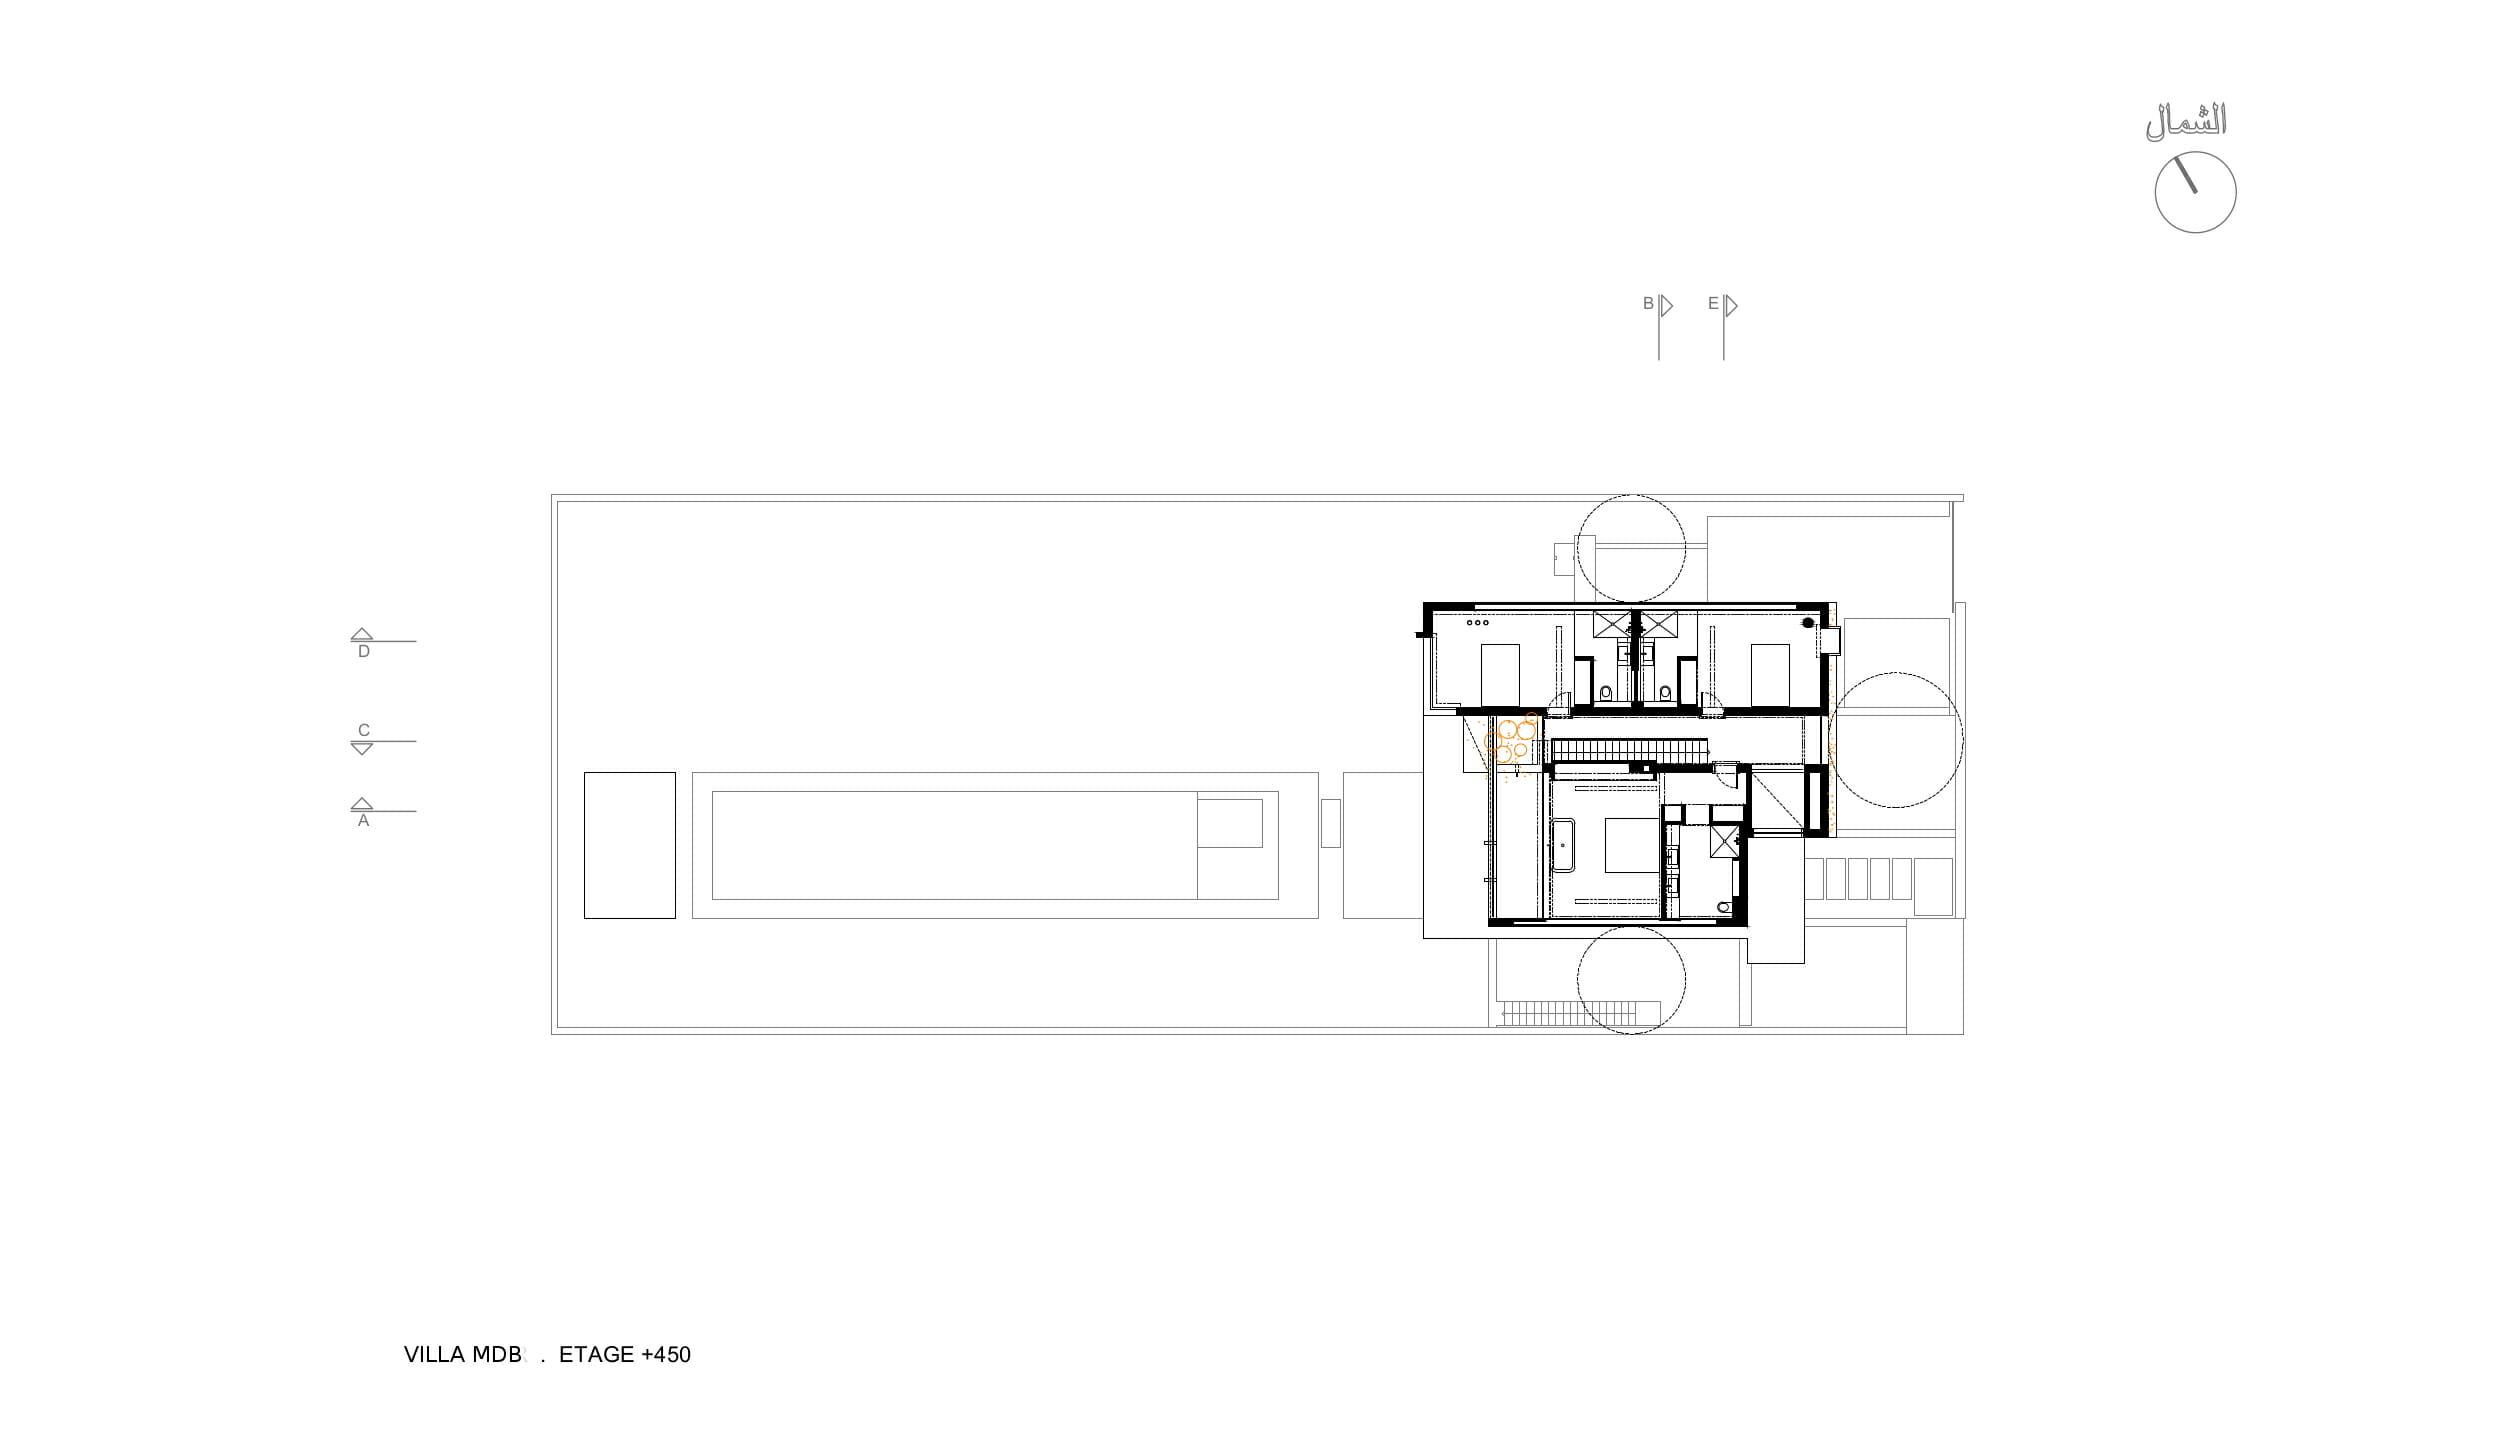 BONAR.plan 02-etage